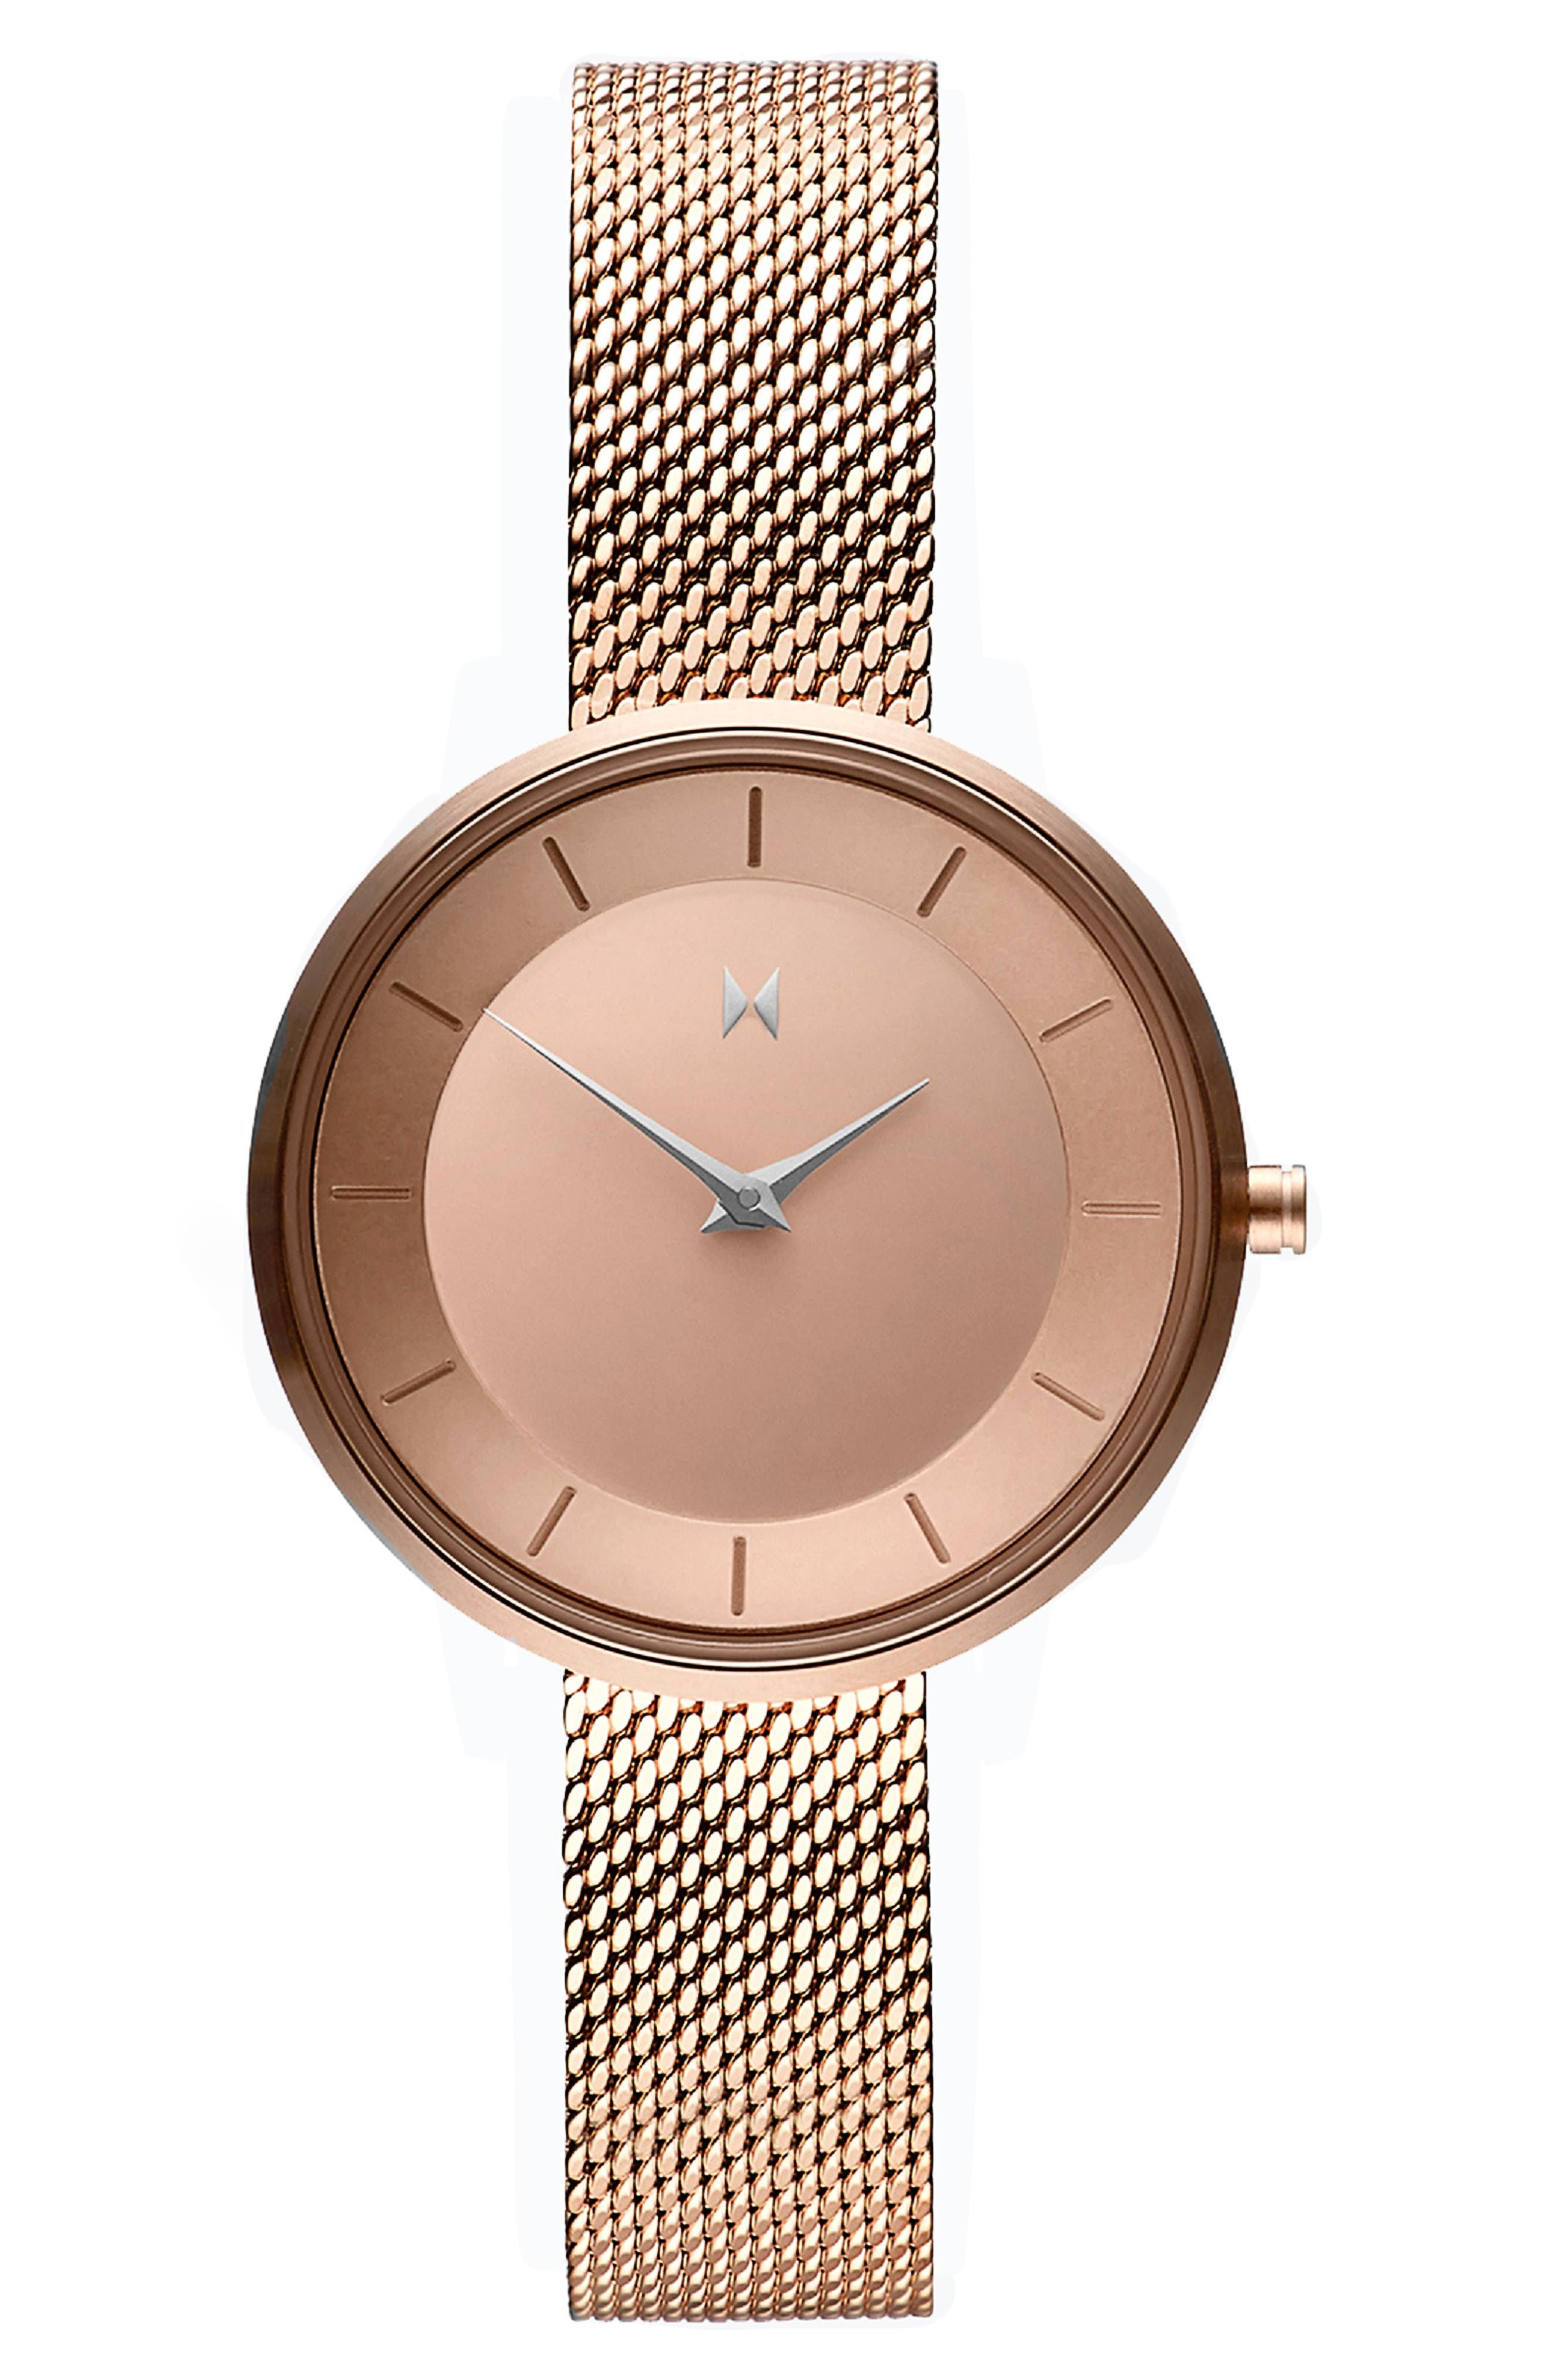 MVMT Mod Mesh Strap Bracelet Watch, 32Mm in Rose Gold